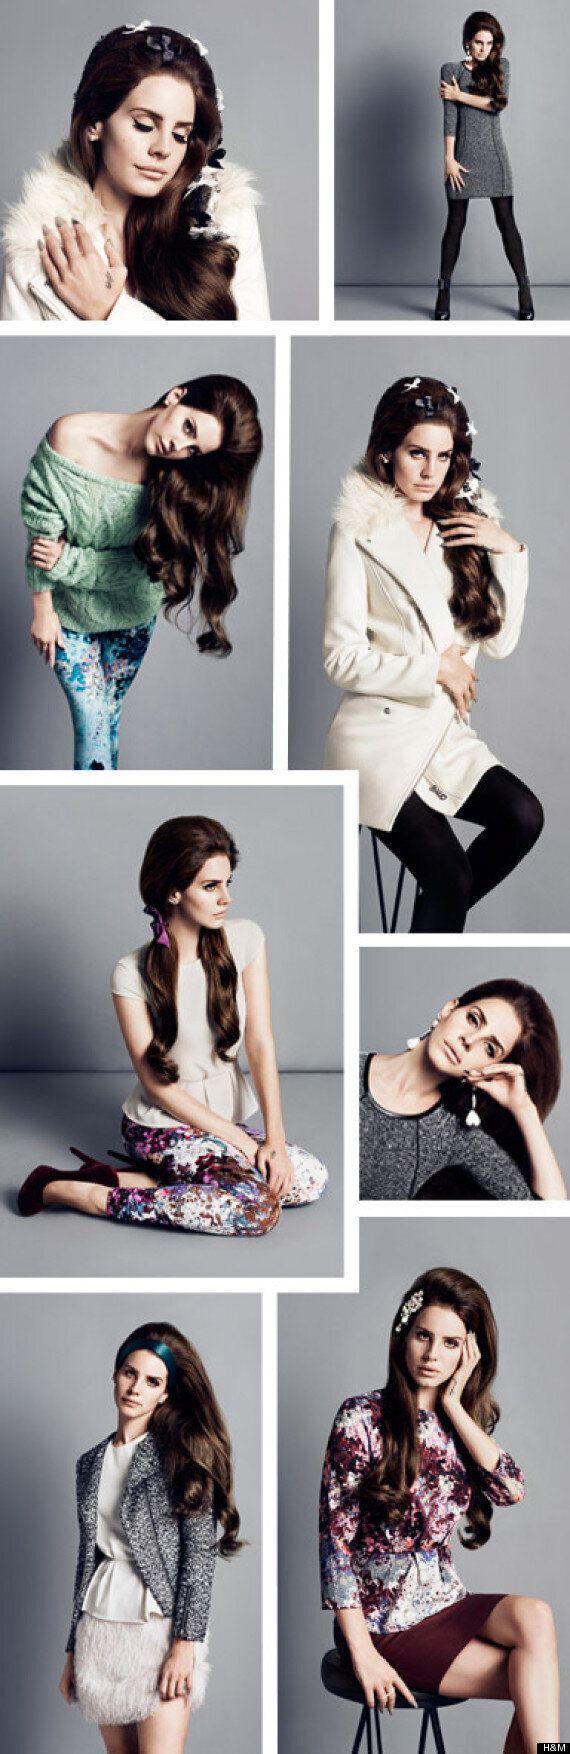 Lana Del Rey Is H&M's Fall 2012